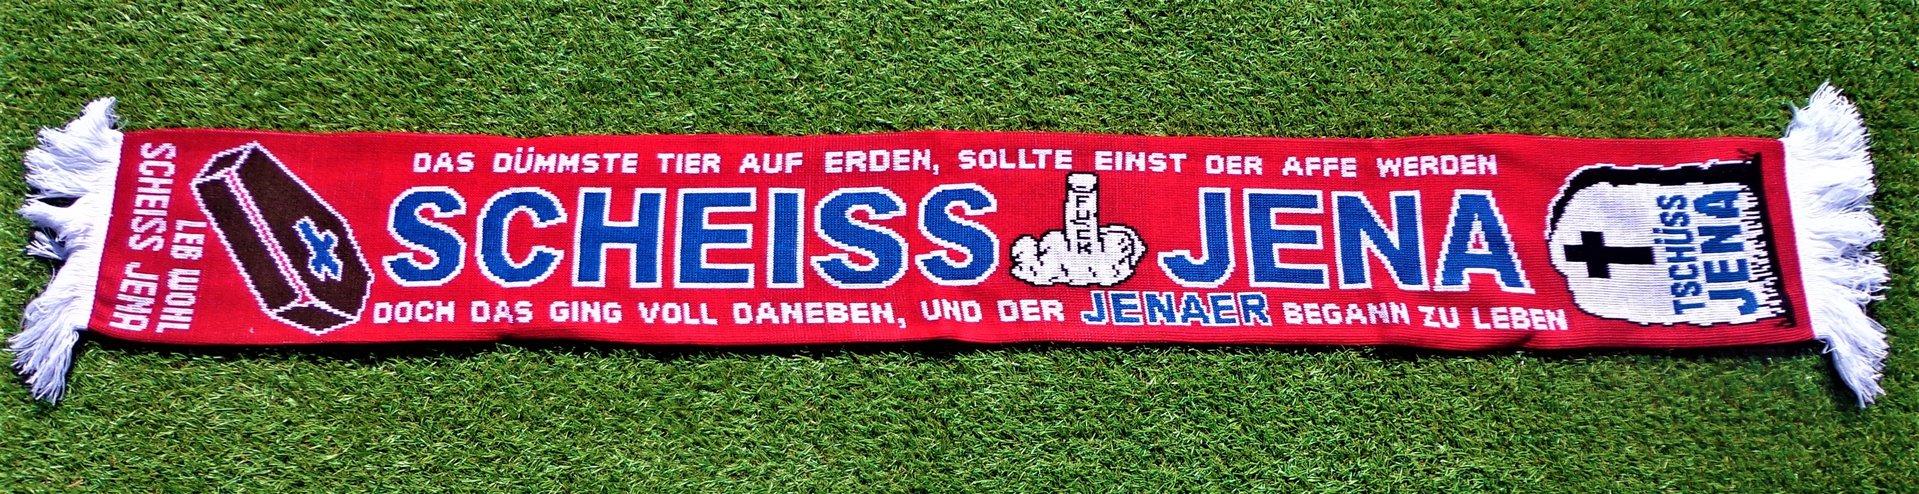 Fanshop Jena